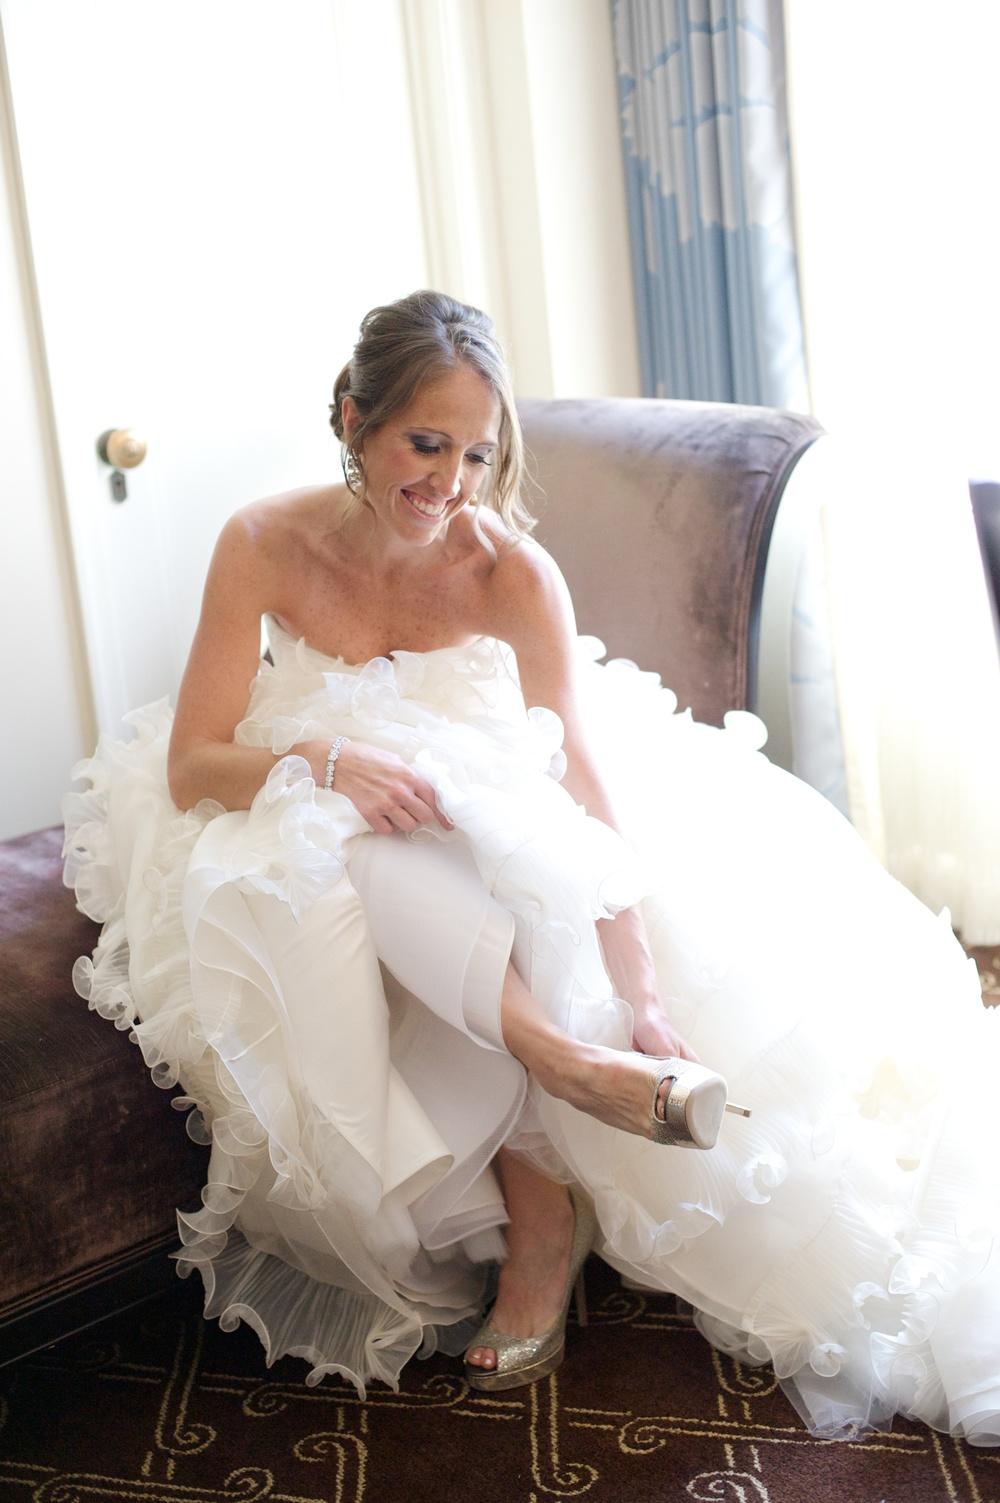 2014.05.25_Yoder-Yelsey_Wedding  2014.05.25_Yoder-Yelsey_Wedding